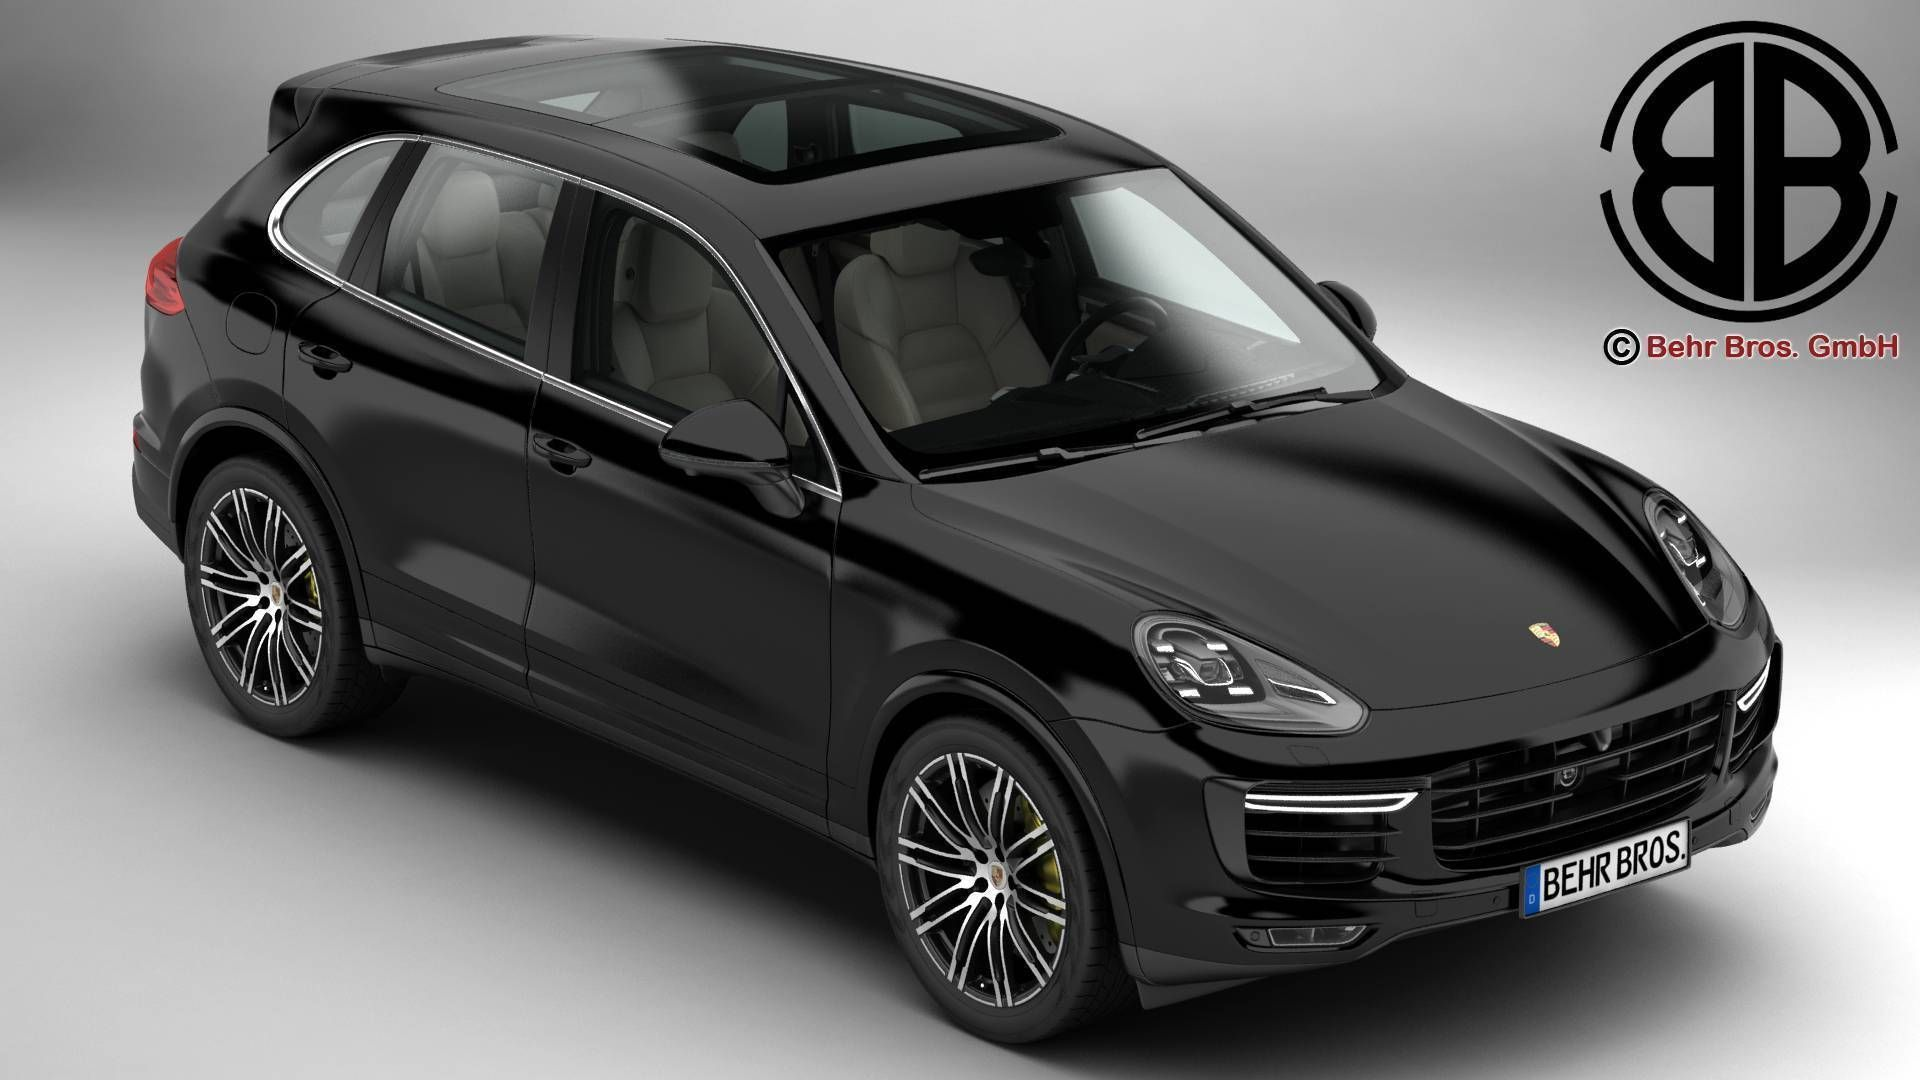 Porsche Cayenne Model Release Date